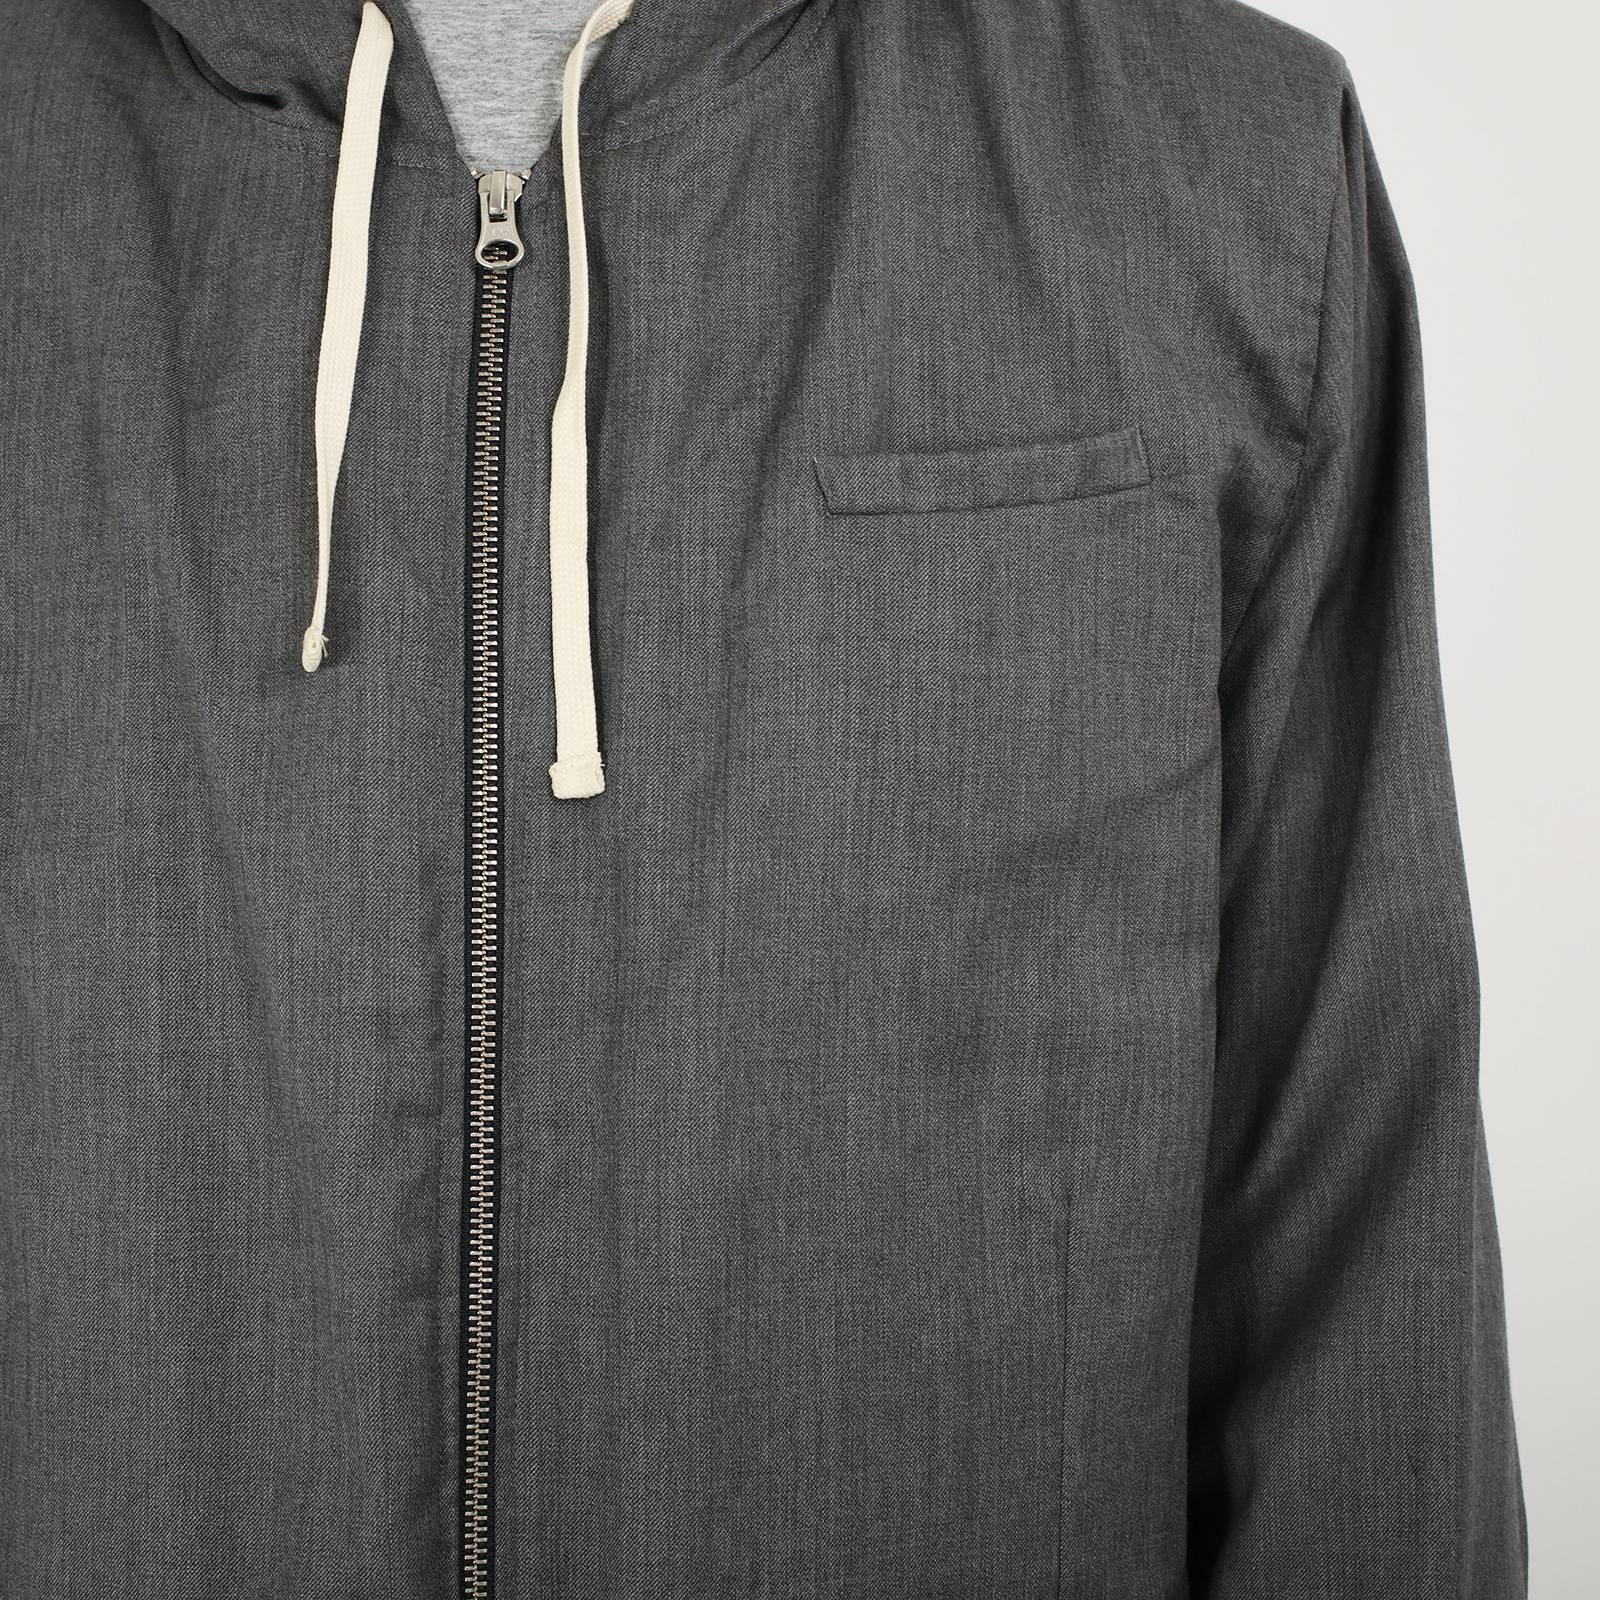 Куртка-пиджак Adidas х David Beckham